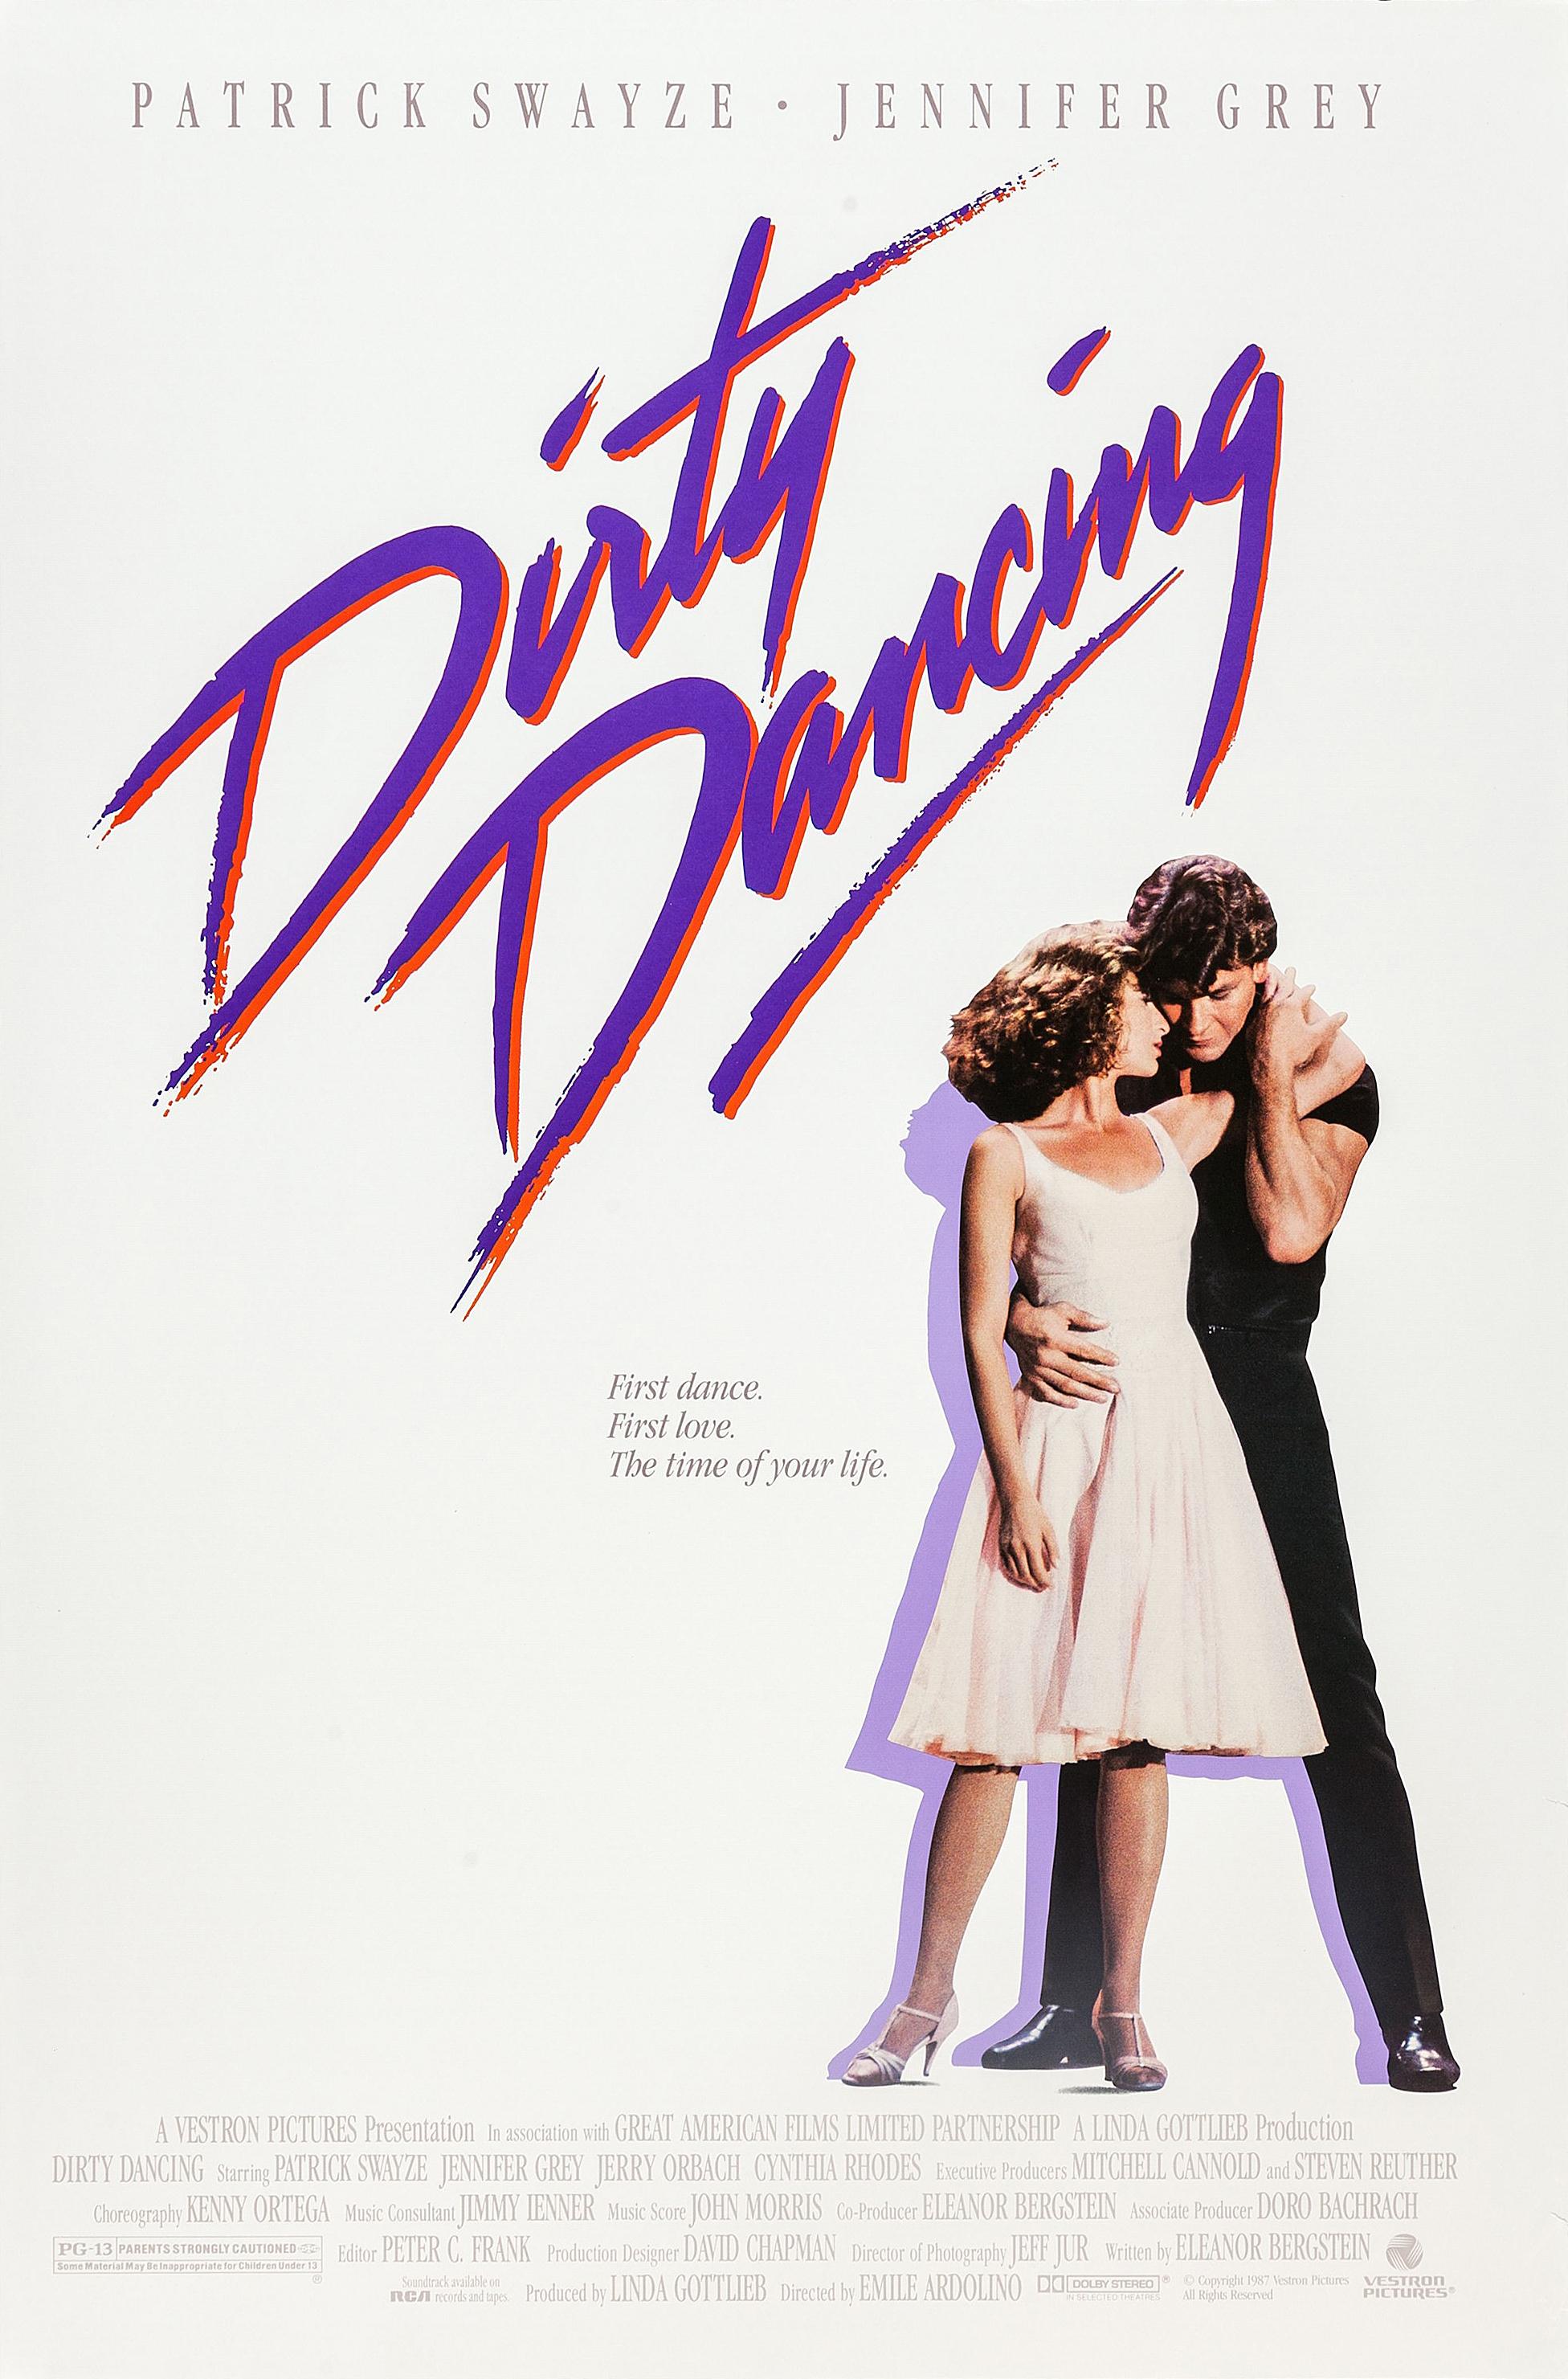 Patrick Swayze Jennifer Grey Dirty Dancing